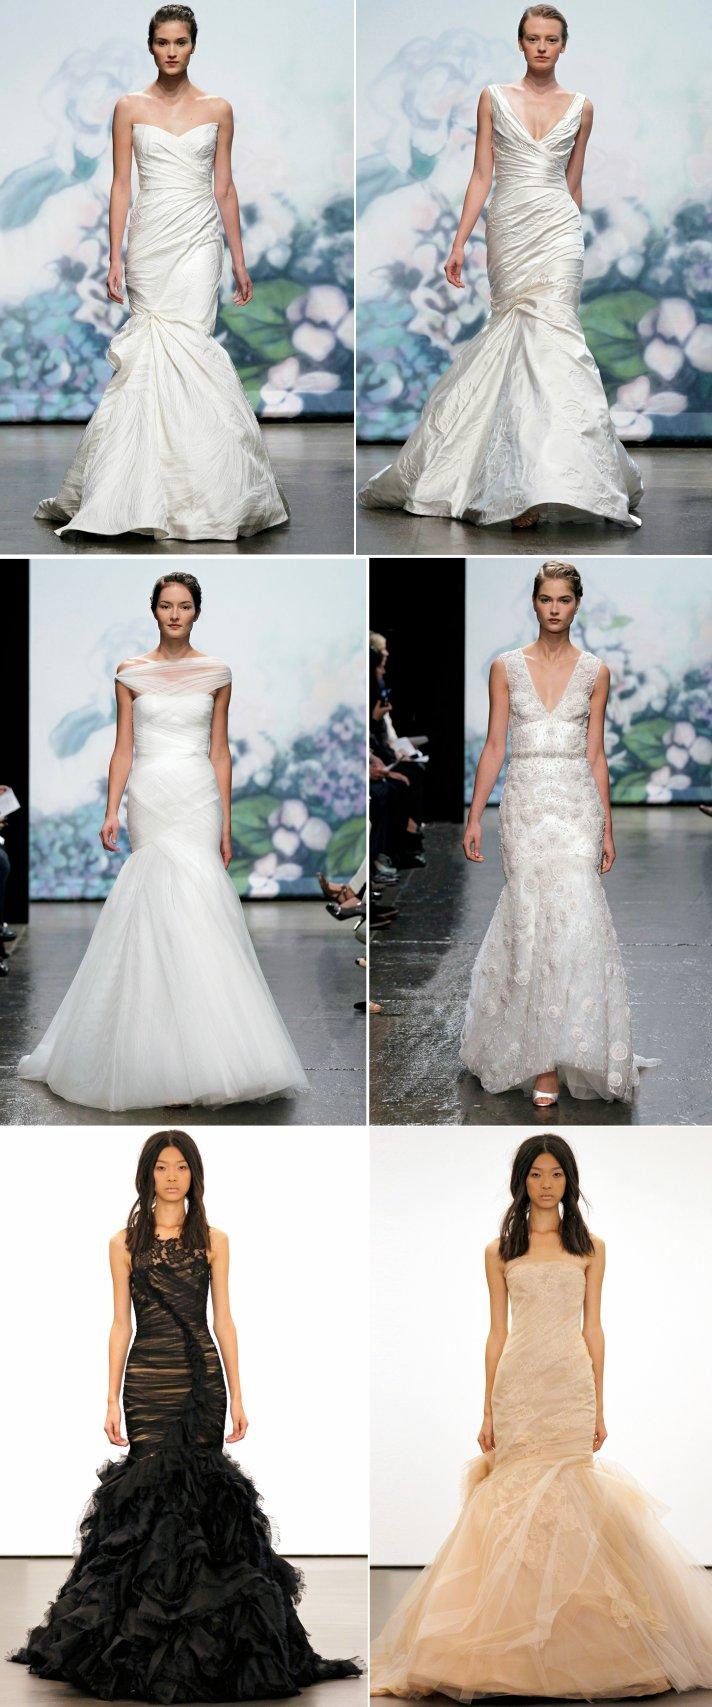 2012 wedding dresses mermaid bridal gown vera wang monique lhuillier